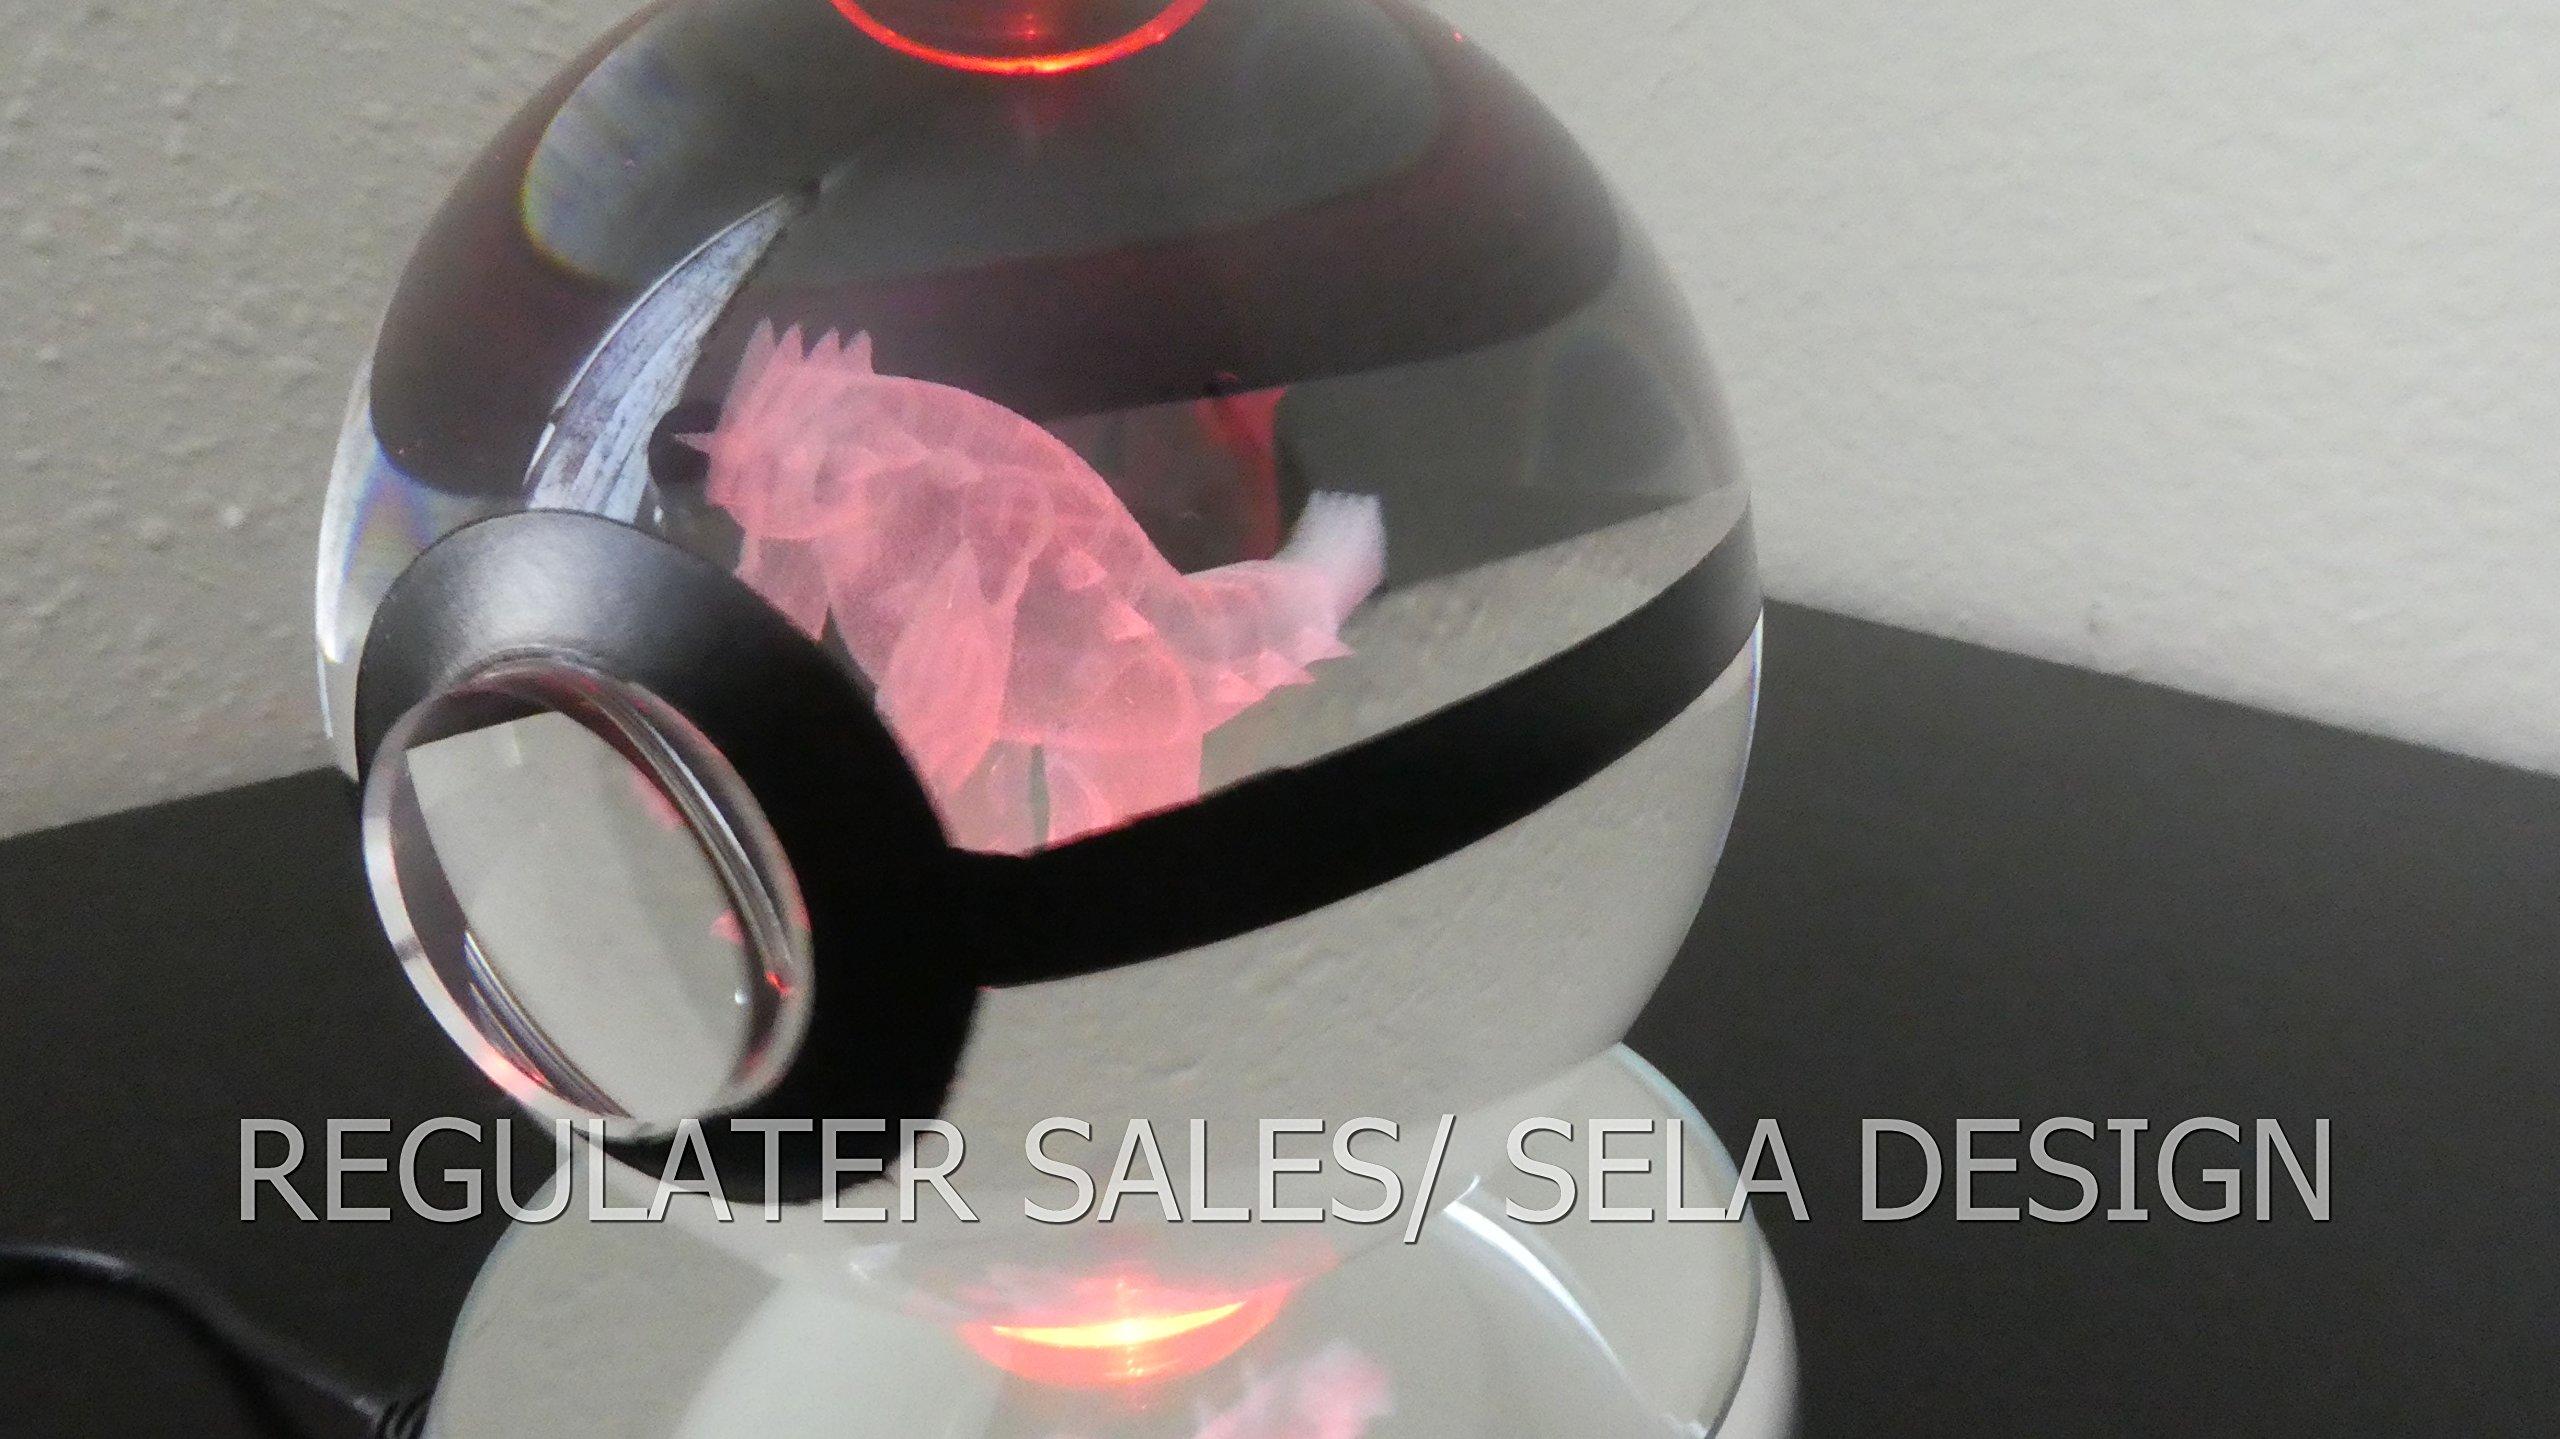 Sela Design. Multiple Designs Pokemon Go inspired Laser K9 crystal Engraved-LED rotating base. Base changes color toy nightlight lamp (Groudon) by sela design (Image #3)